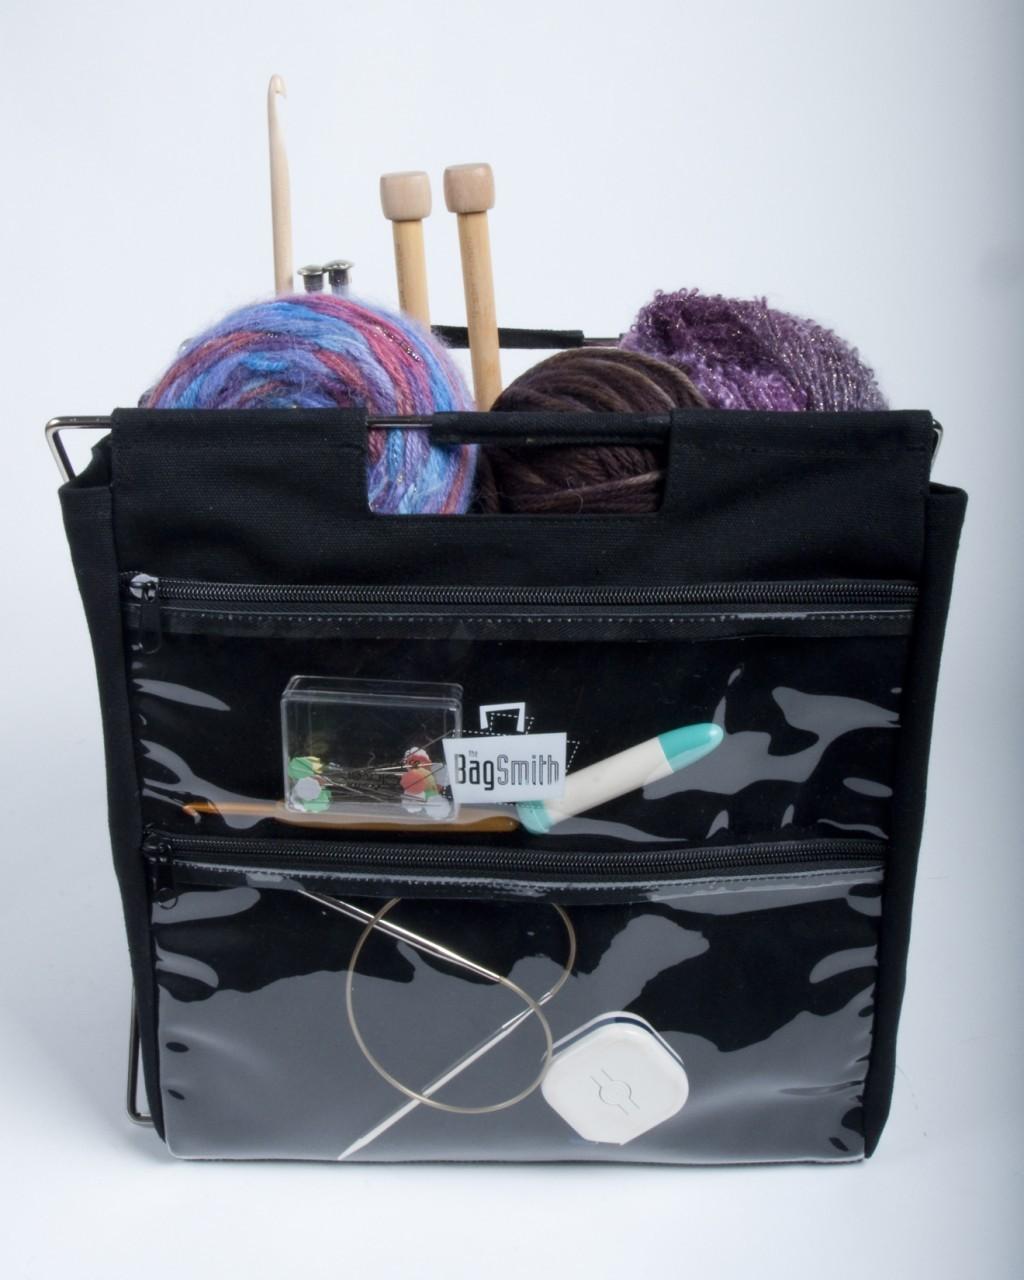 bagsmithknitting